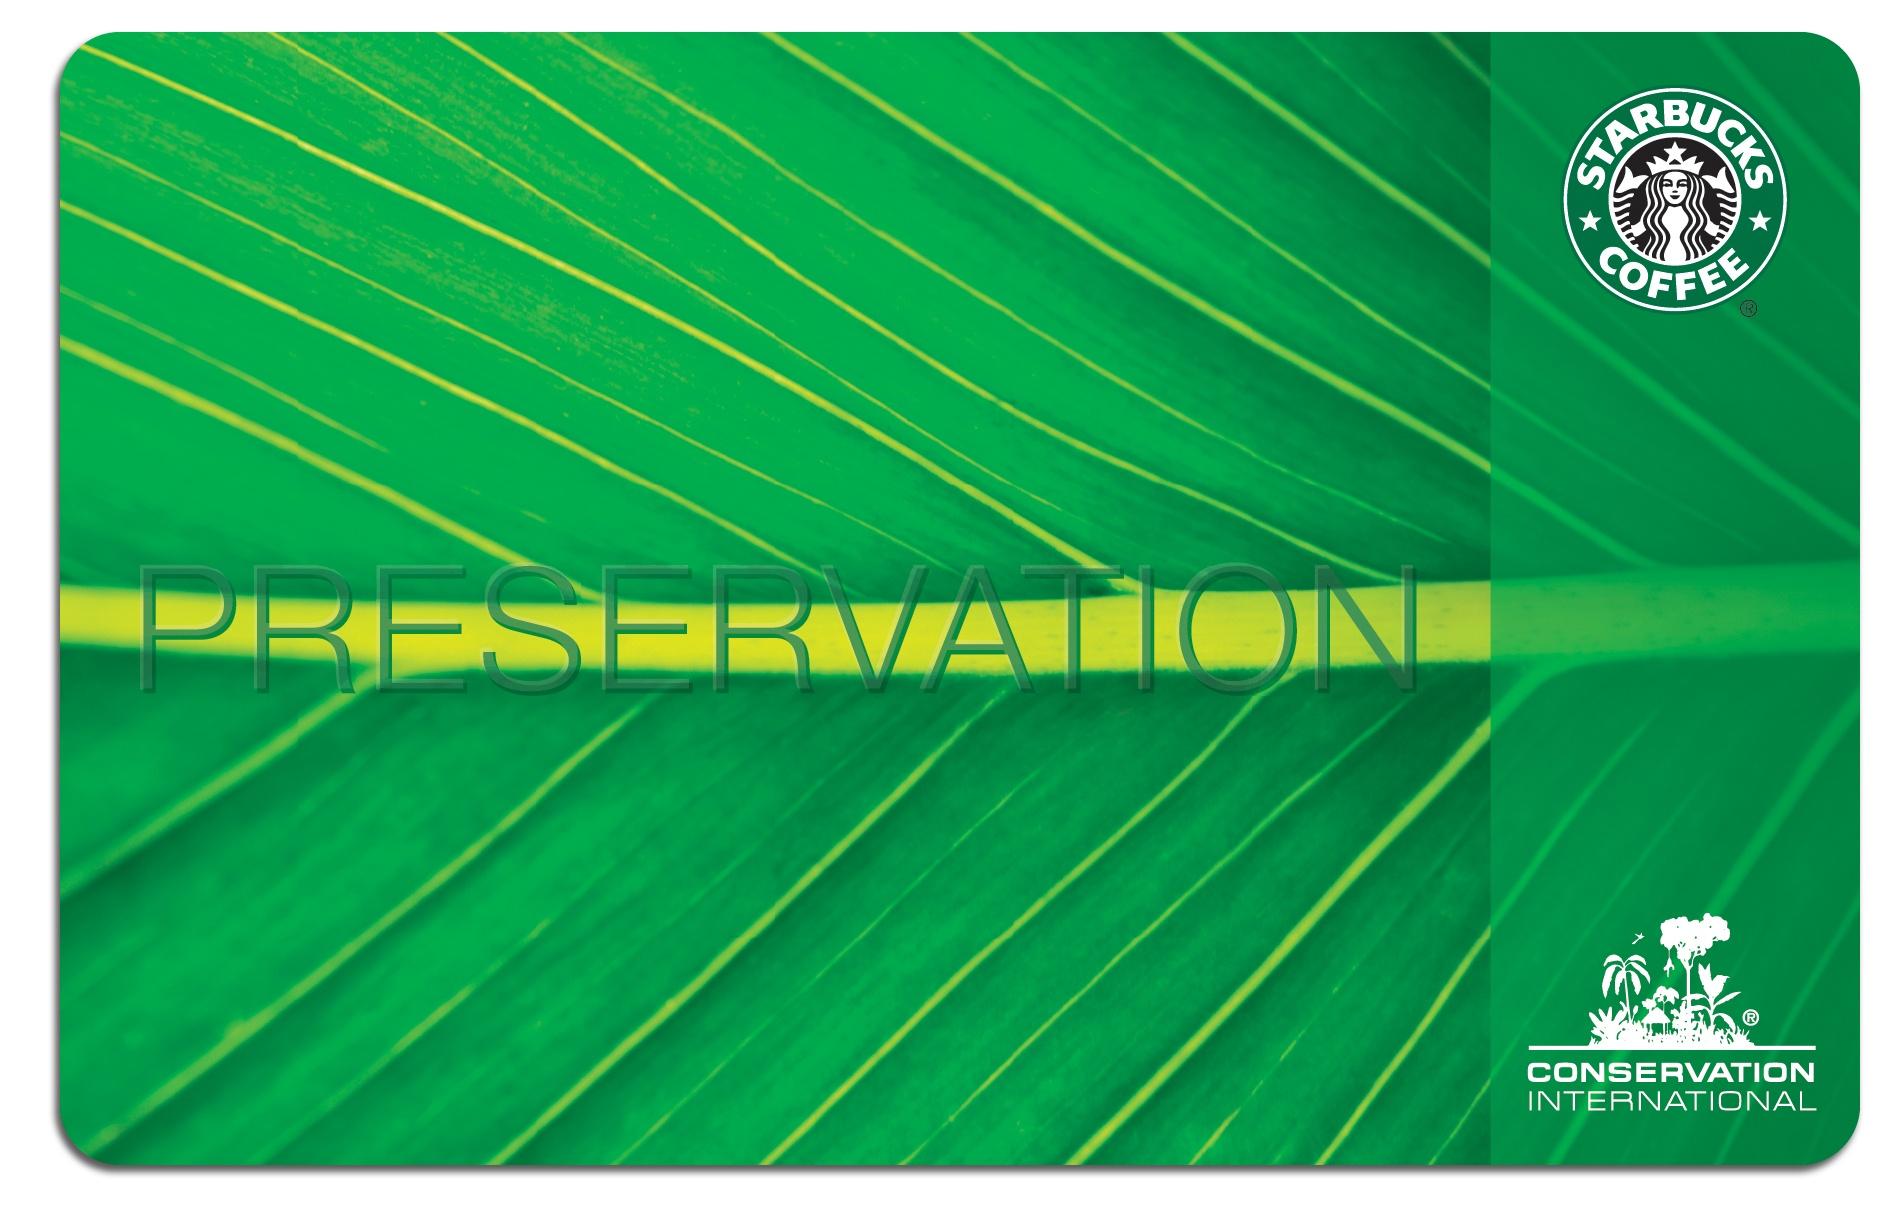 Starbucks and Conservation International